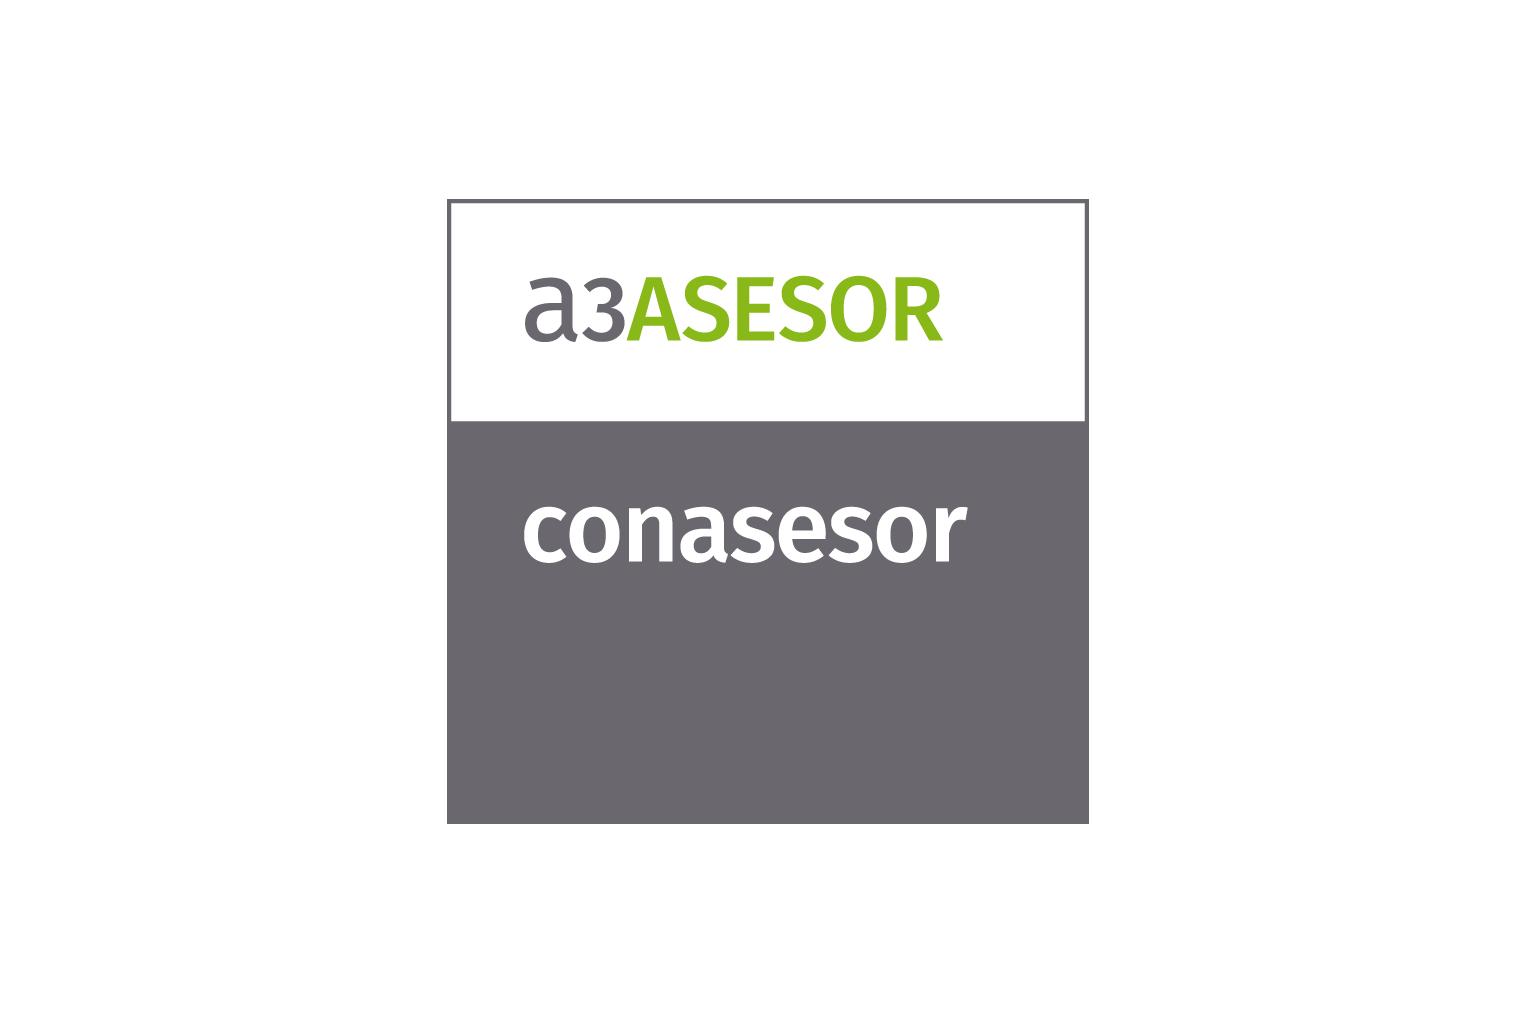 a3ASESOR-conasesor